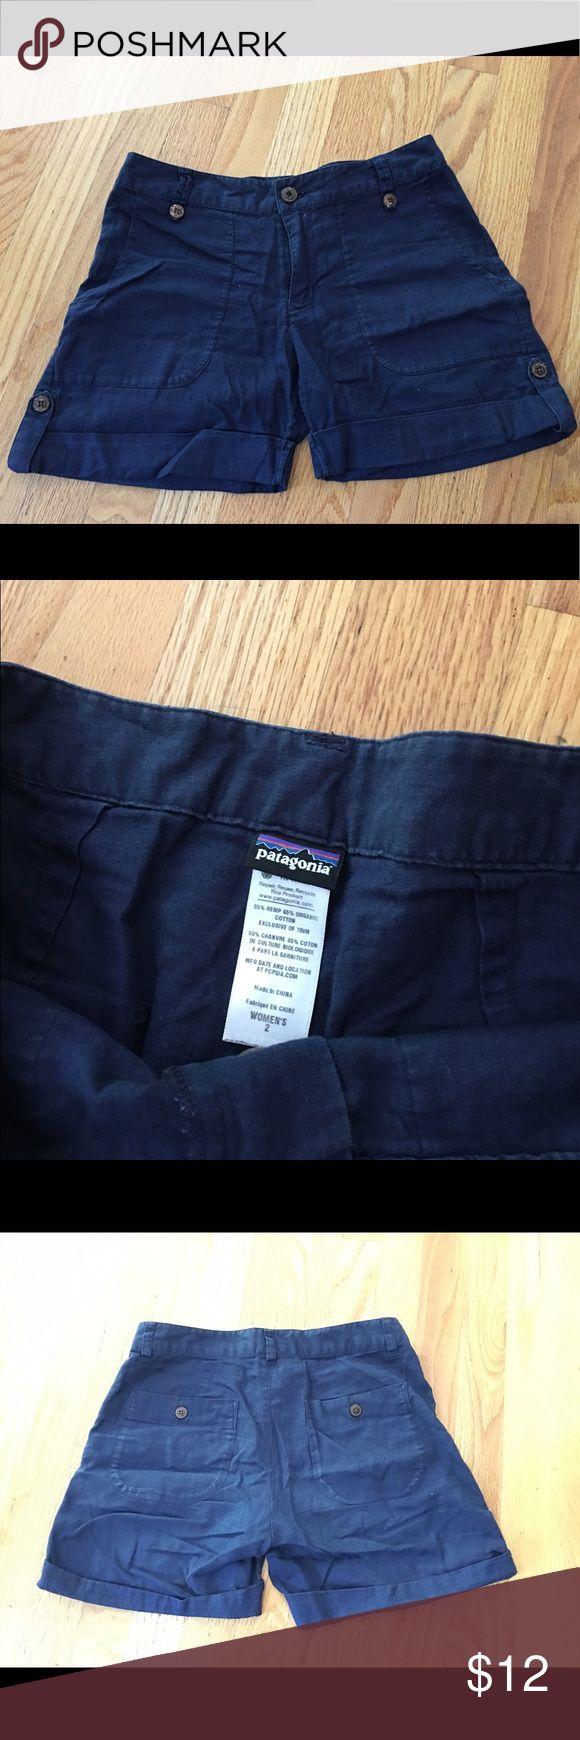 Patagonia island shorts navy Patagonia island shorts navy Patagonia Shorts Skorts